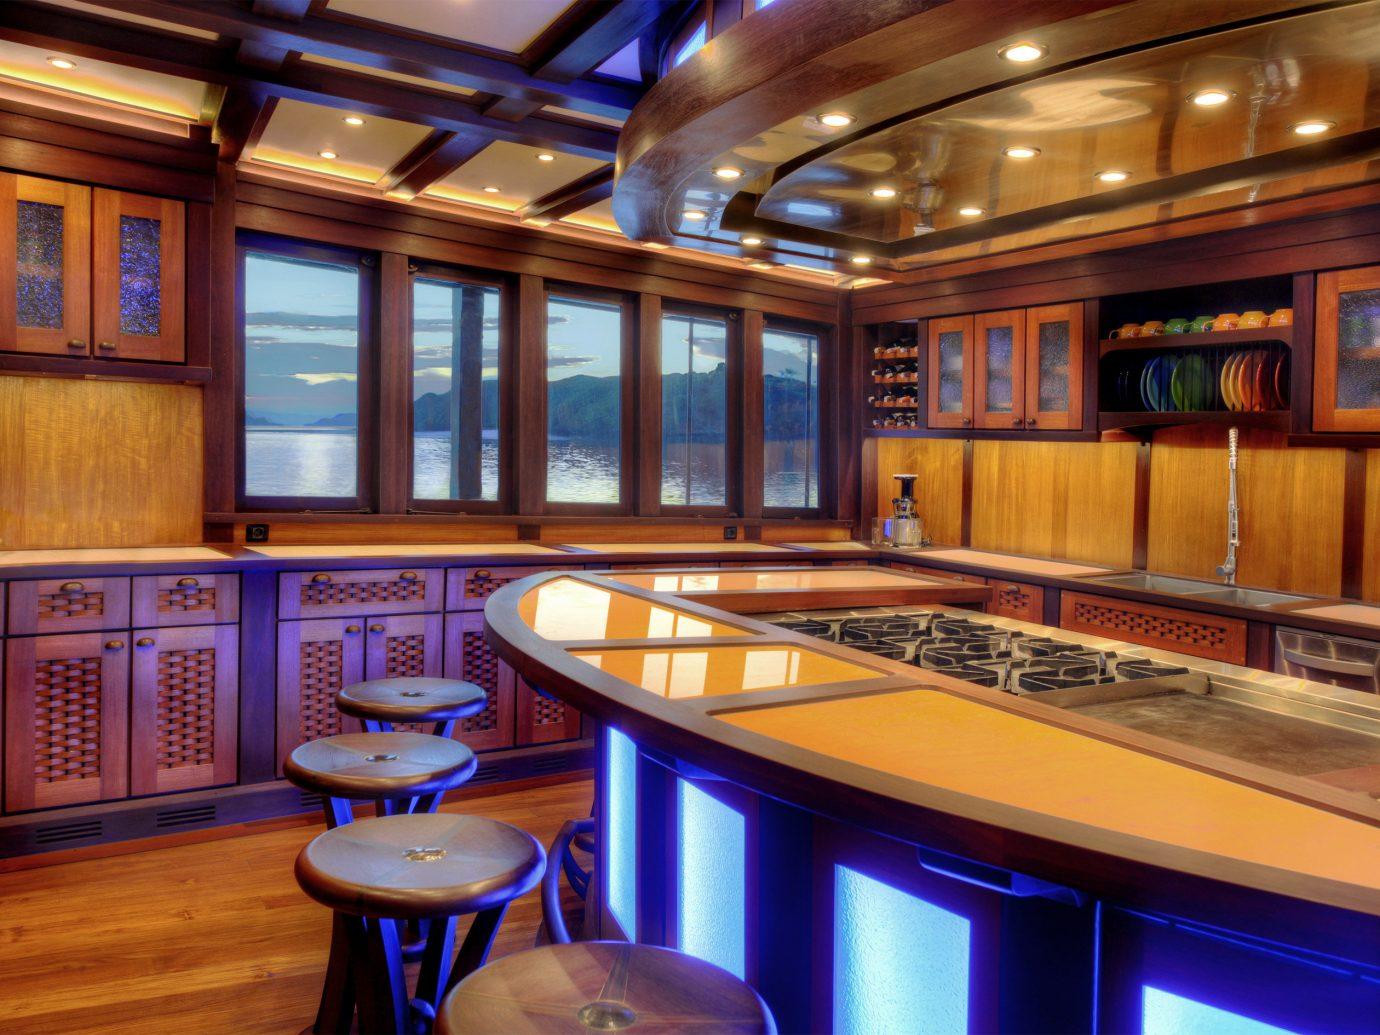 Luxury Travel Trip Ideas indoor ceiling floor interior design lighting recreation room wood restaurant estate countertop Bar